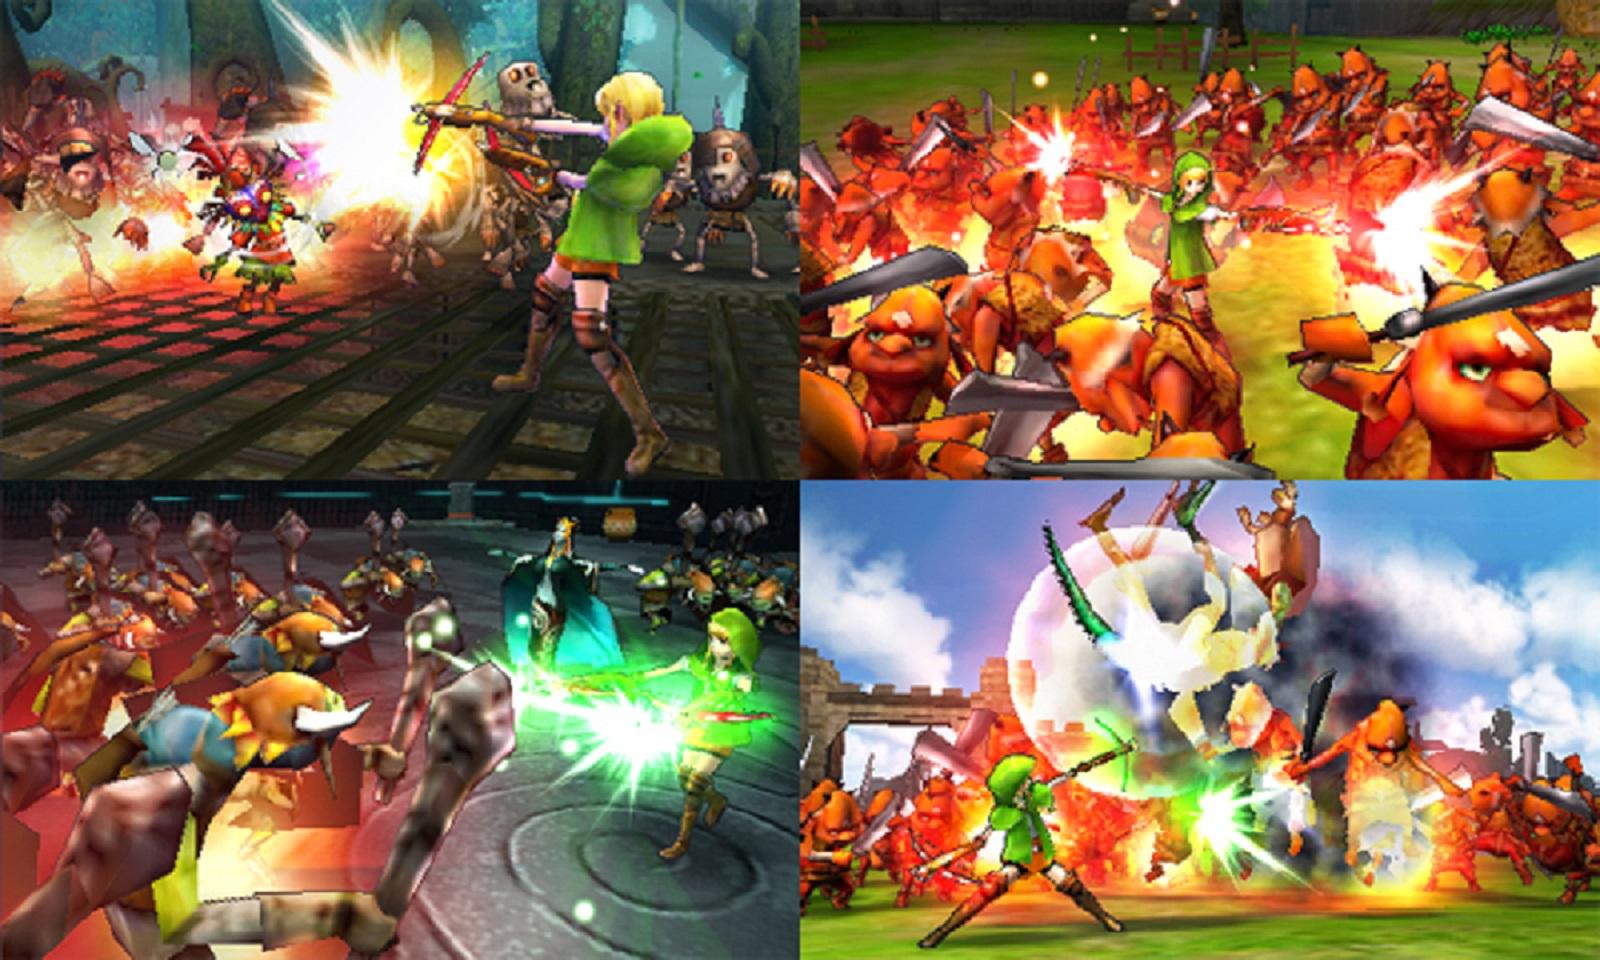 Hyrule Warriors Legends Linkle Attacks Gameplay Screenshot 3ds